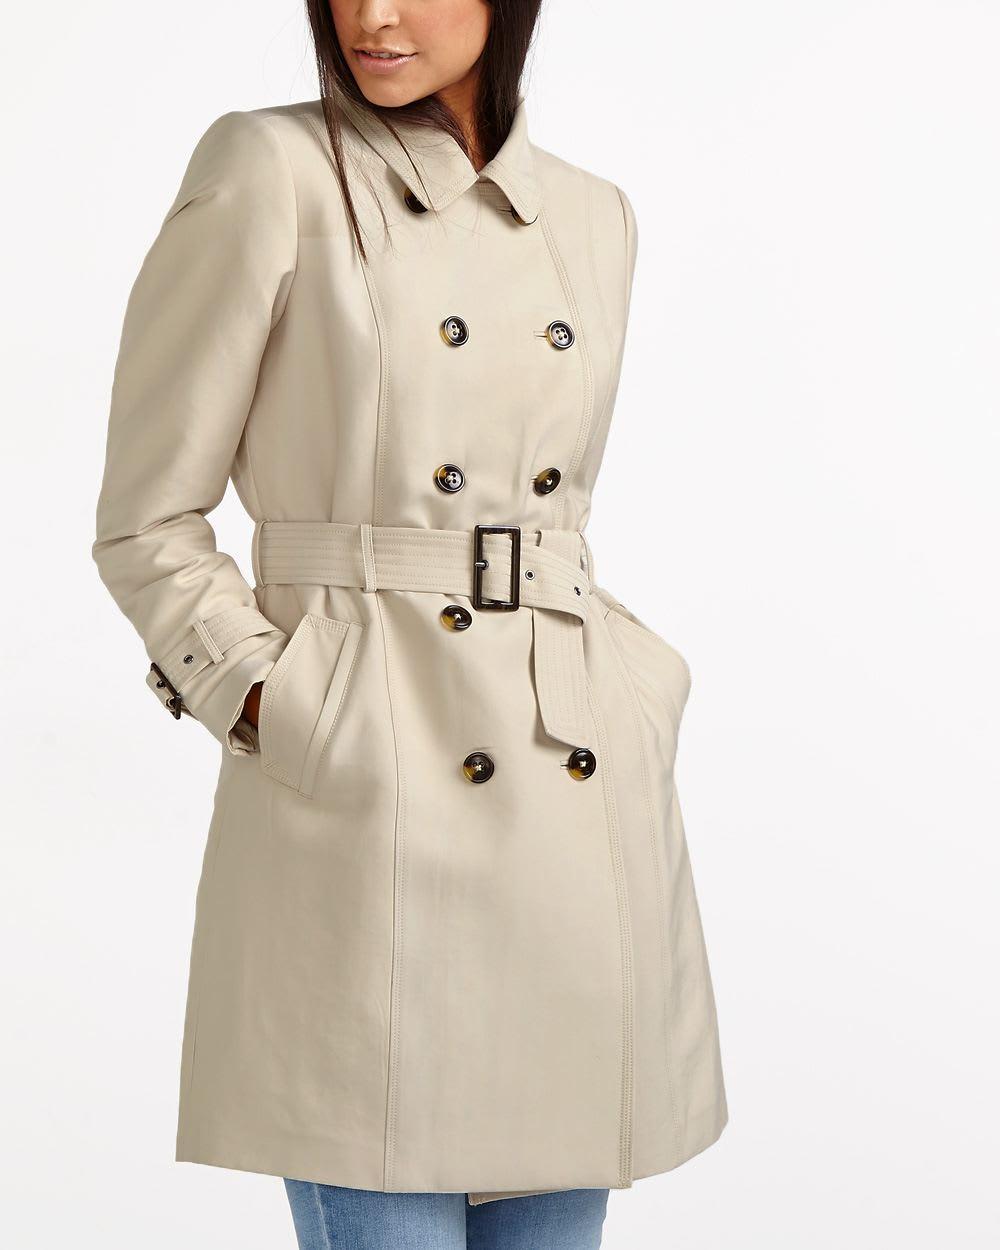 petite-ladies-coats